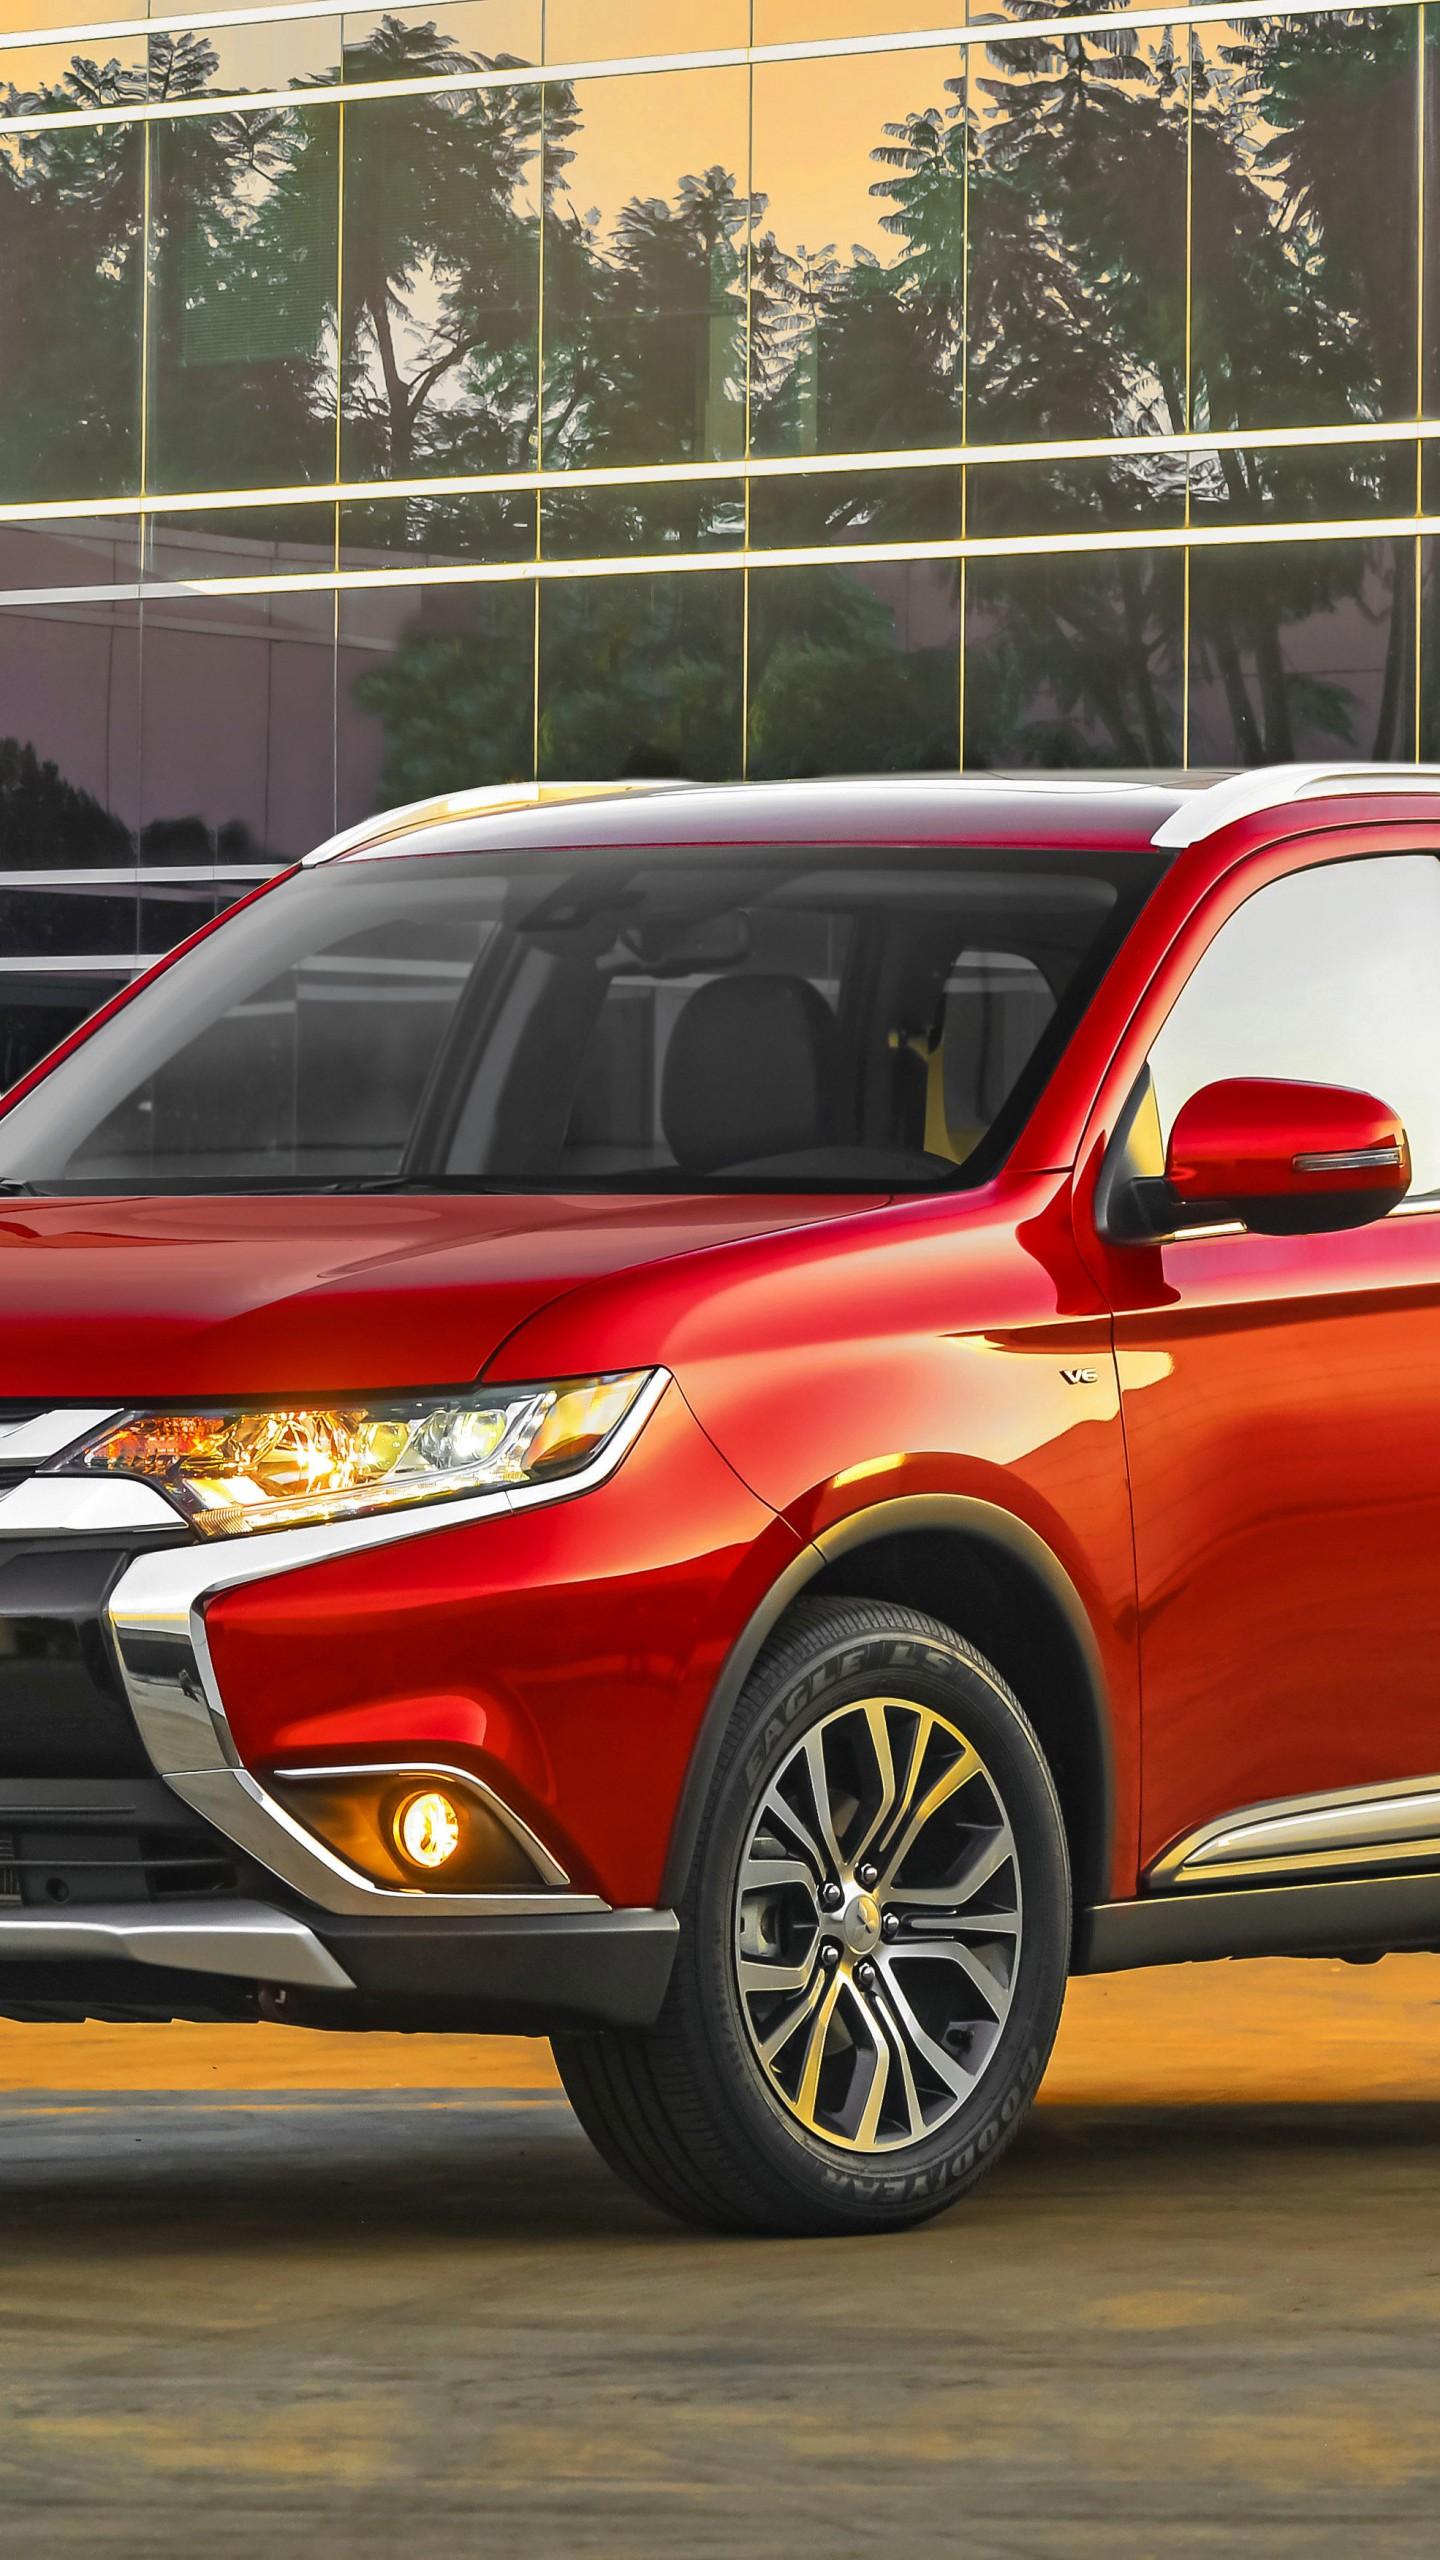 Lexus Electric Car >> Wallpaper Mitsubishi Outlander, Hybrid, SUV, red, Cars & Bikes #6380